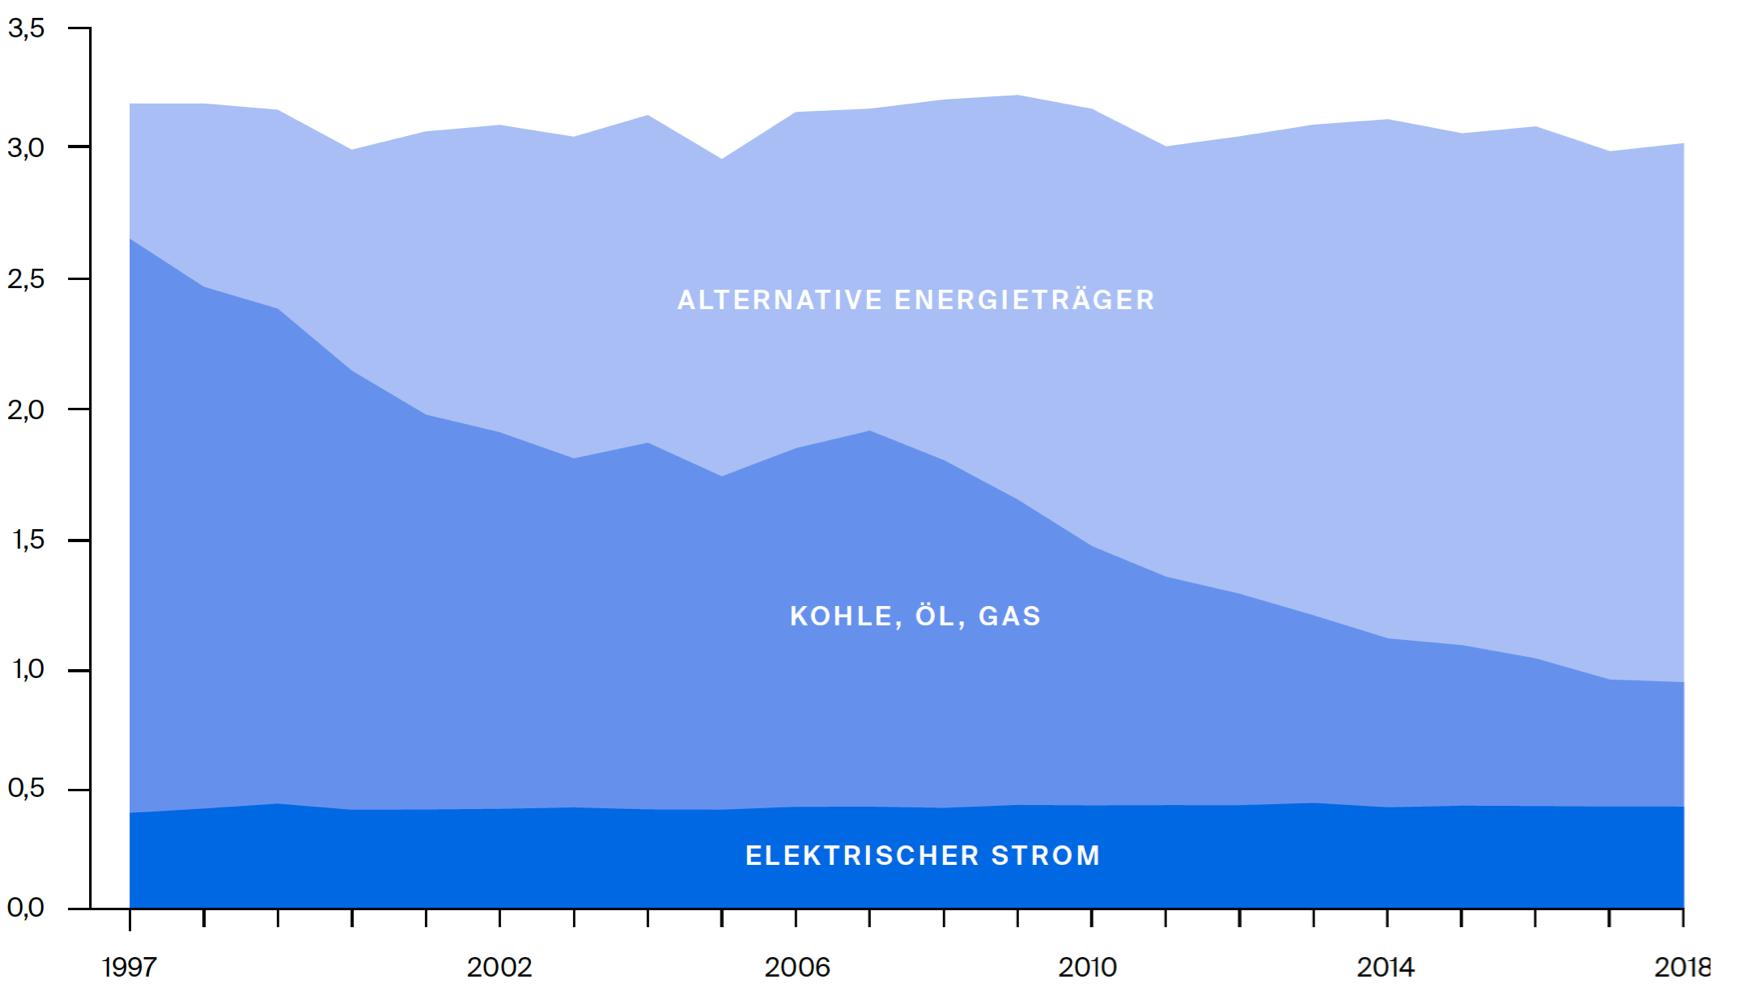 Spezifischer Energiebedarf (GJ/t Zement)